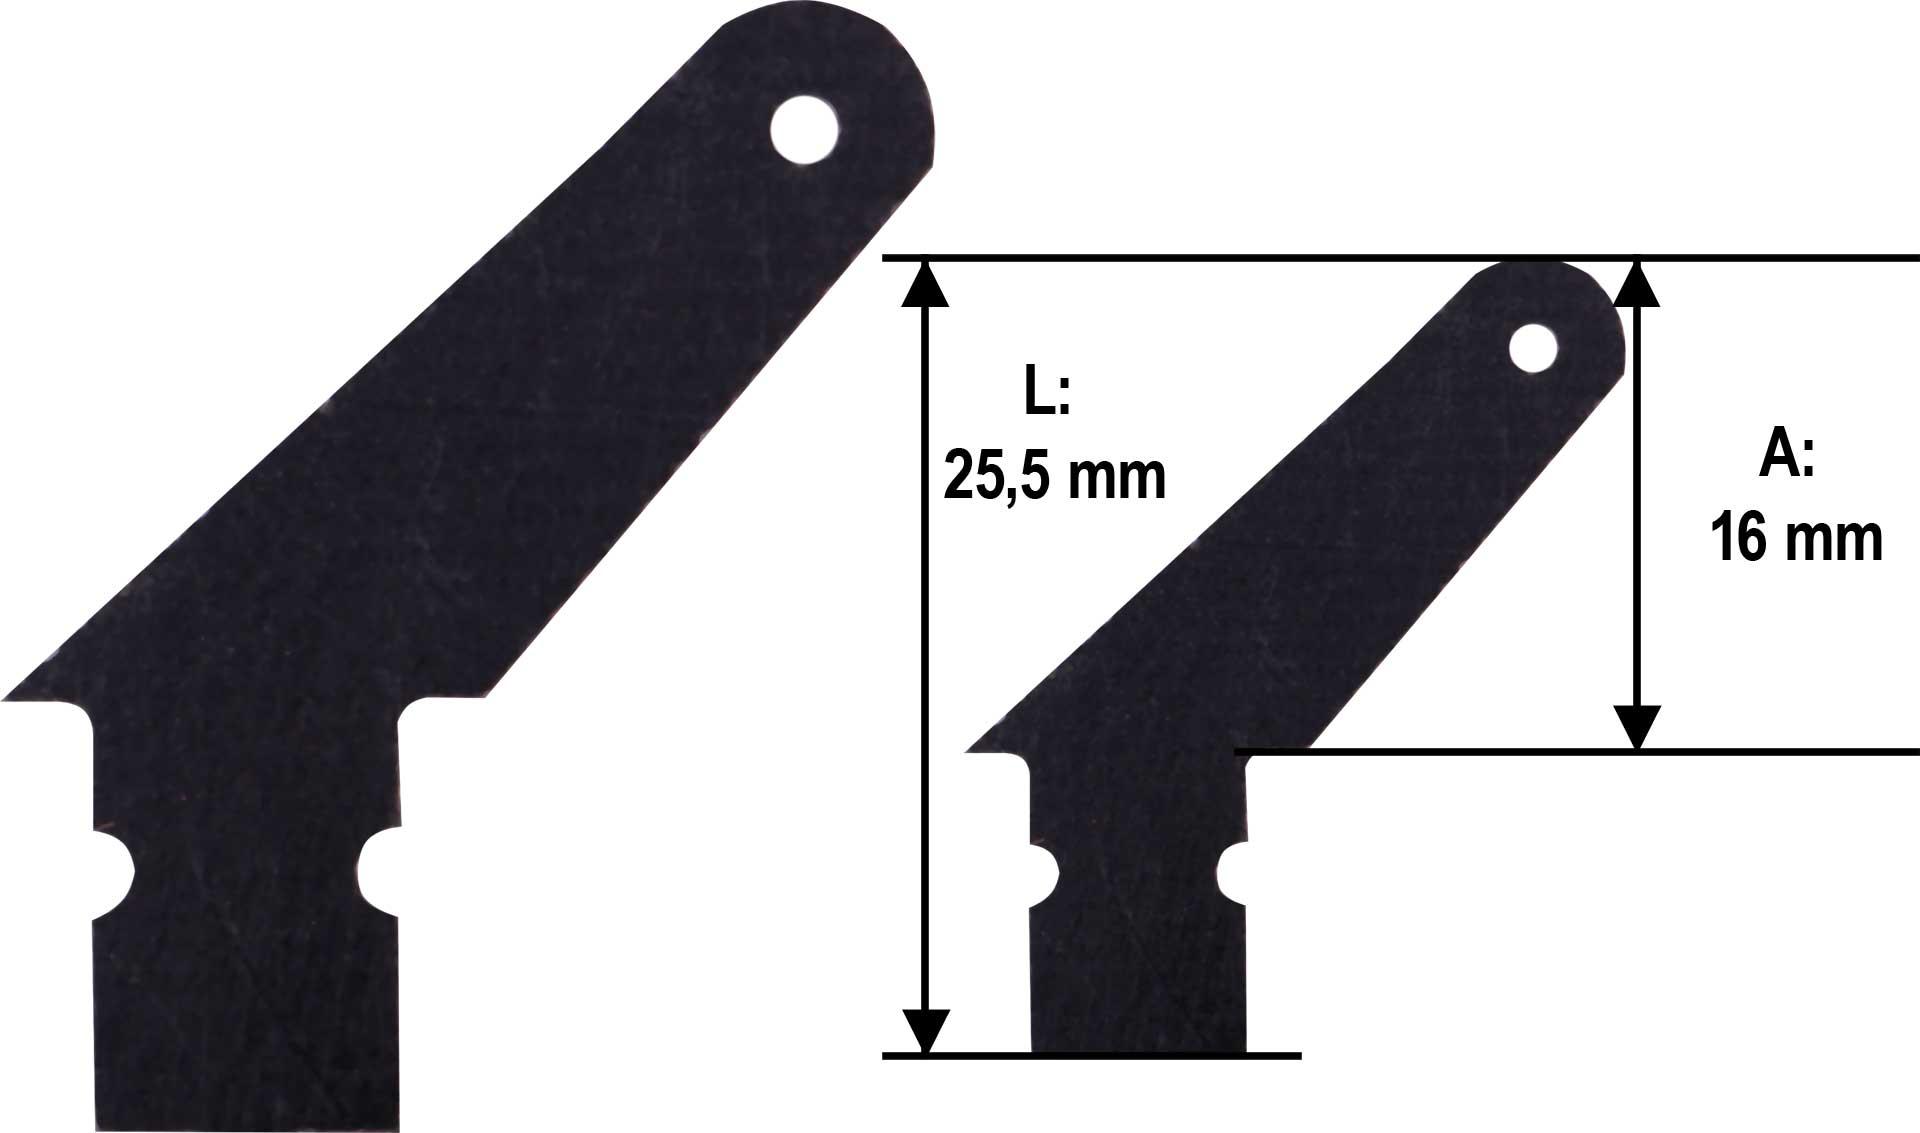 MODELLBAU LINDINGER GFK Ruderhorn 13mm Set 10Stk. 1,5mm GFK schwarz